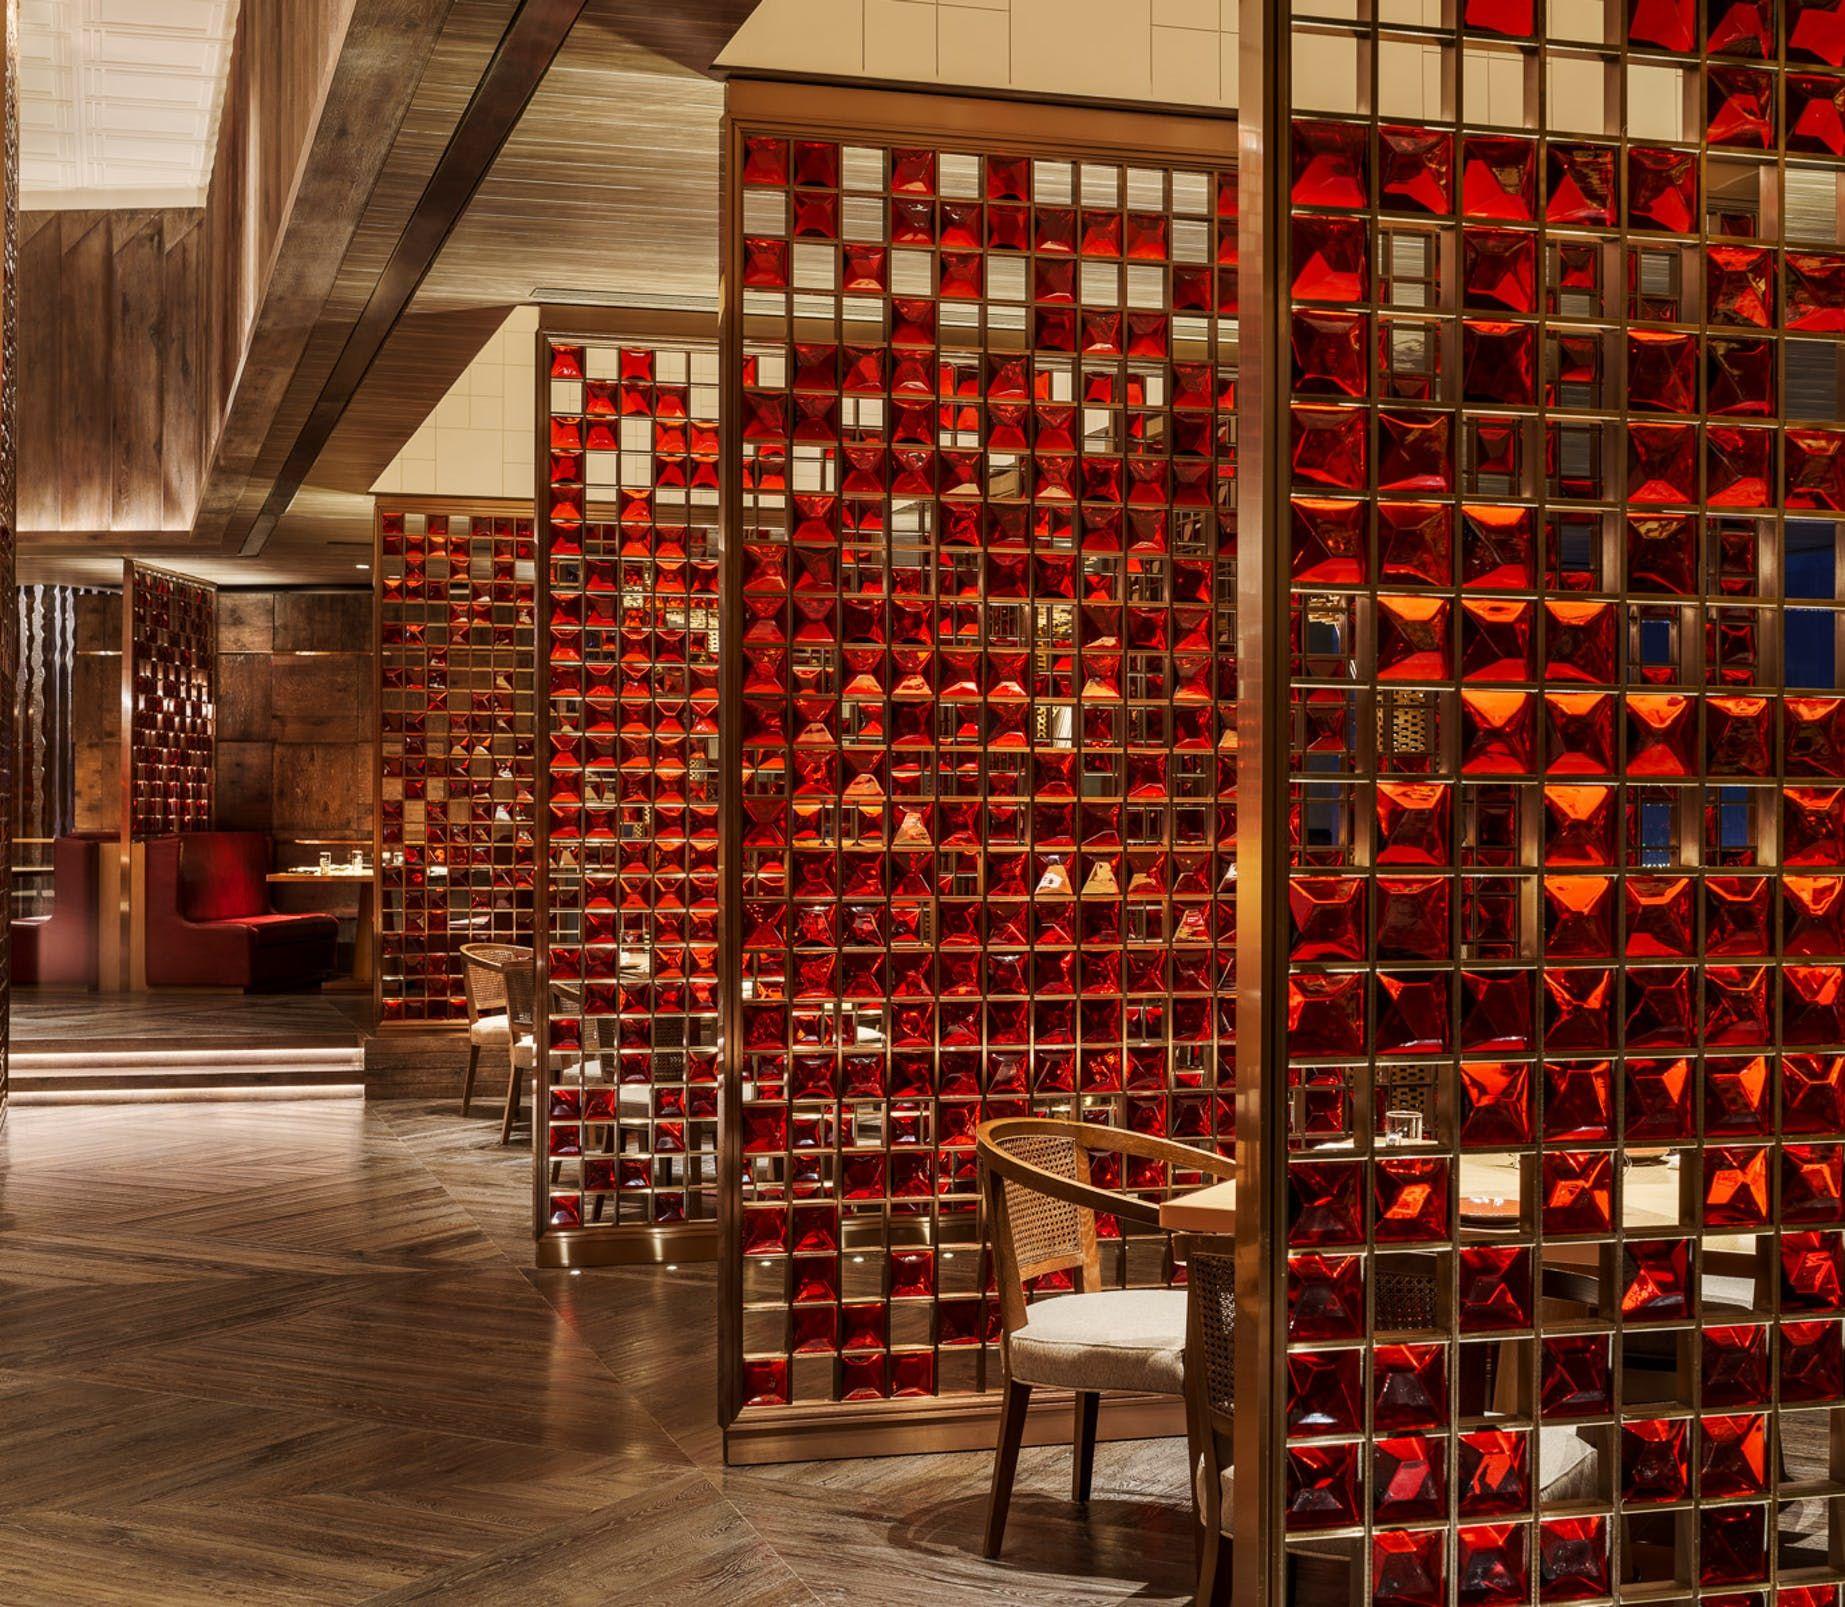 Grand Hyatt Xi An Ltw Designworks Seth Powers Photography Archinect In 2020 Restaurant Seating Grand Hyatt Chinese Restaurant